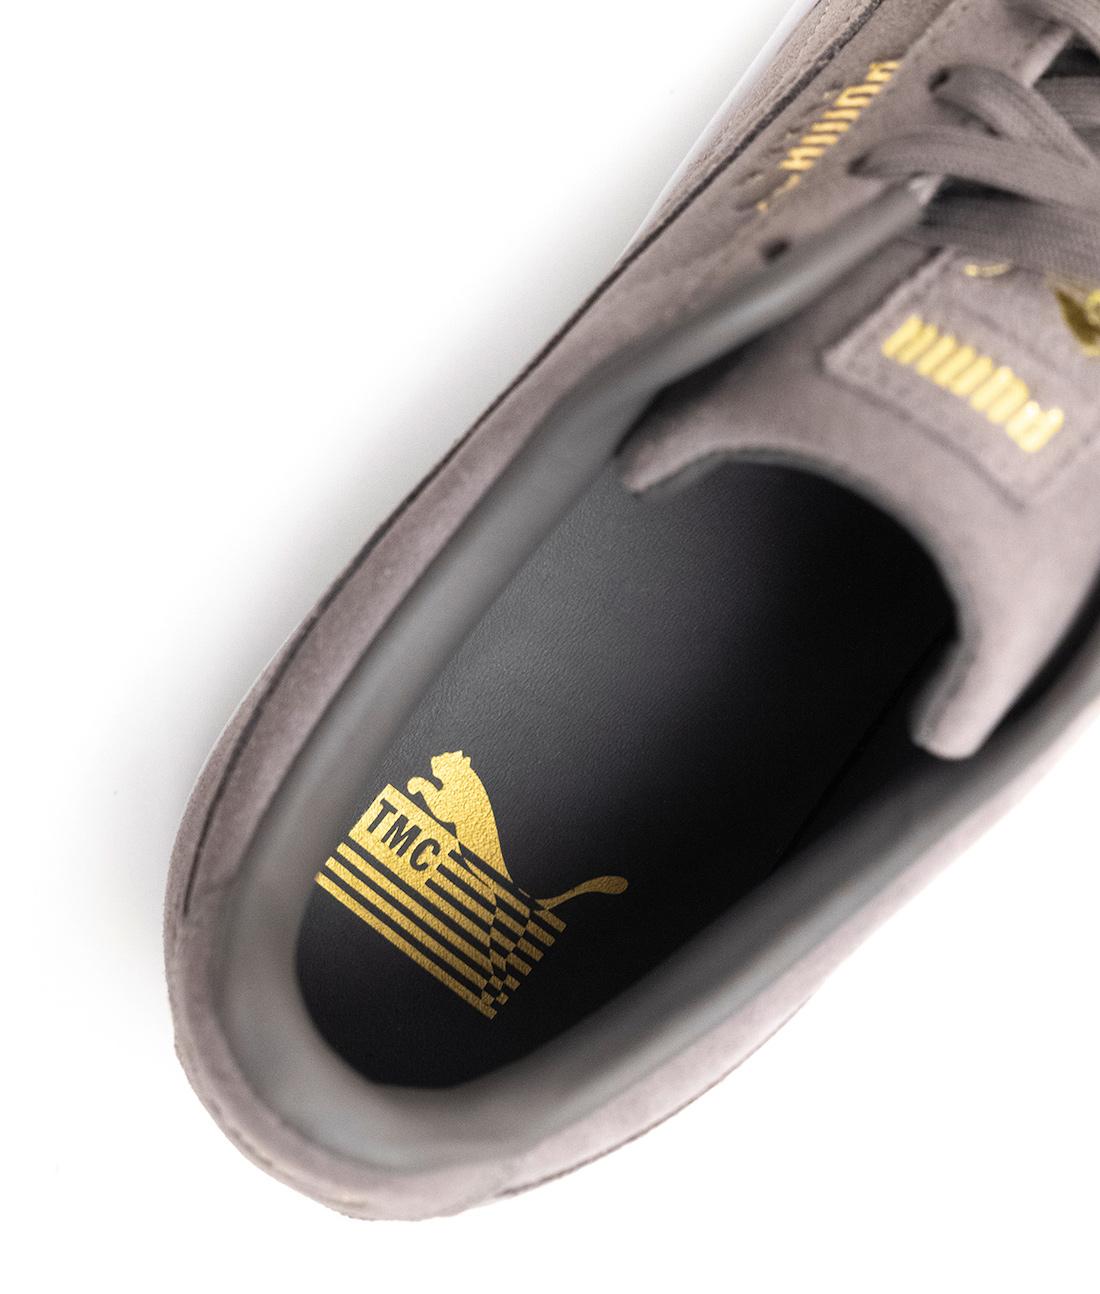 nipsey-hussle-tmc-puma-suede-shoe-shirt-release-date-1